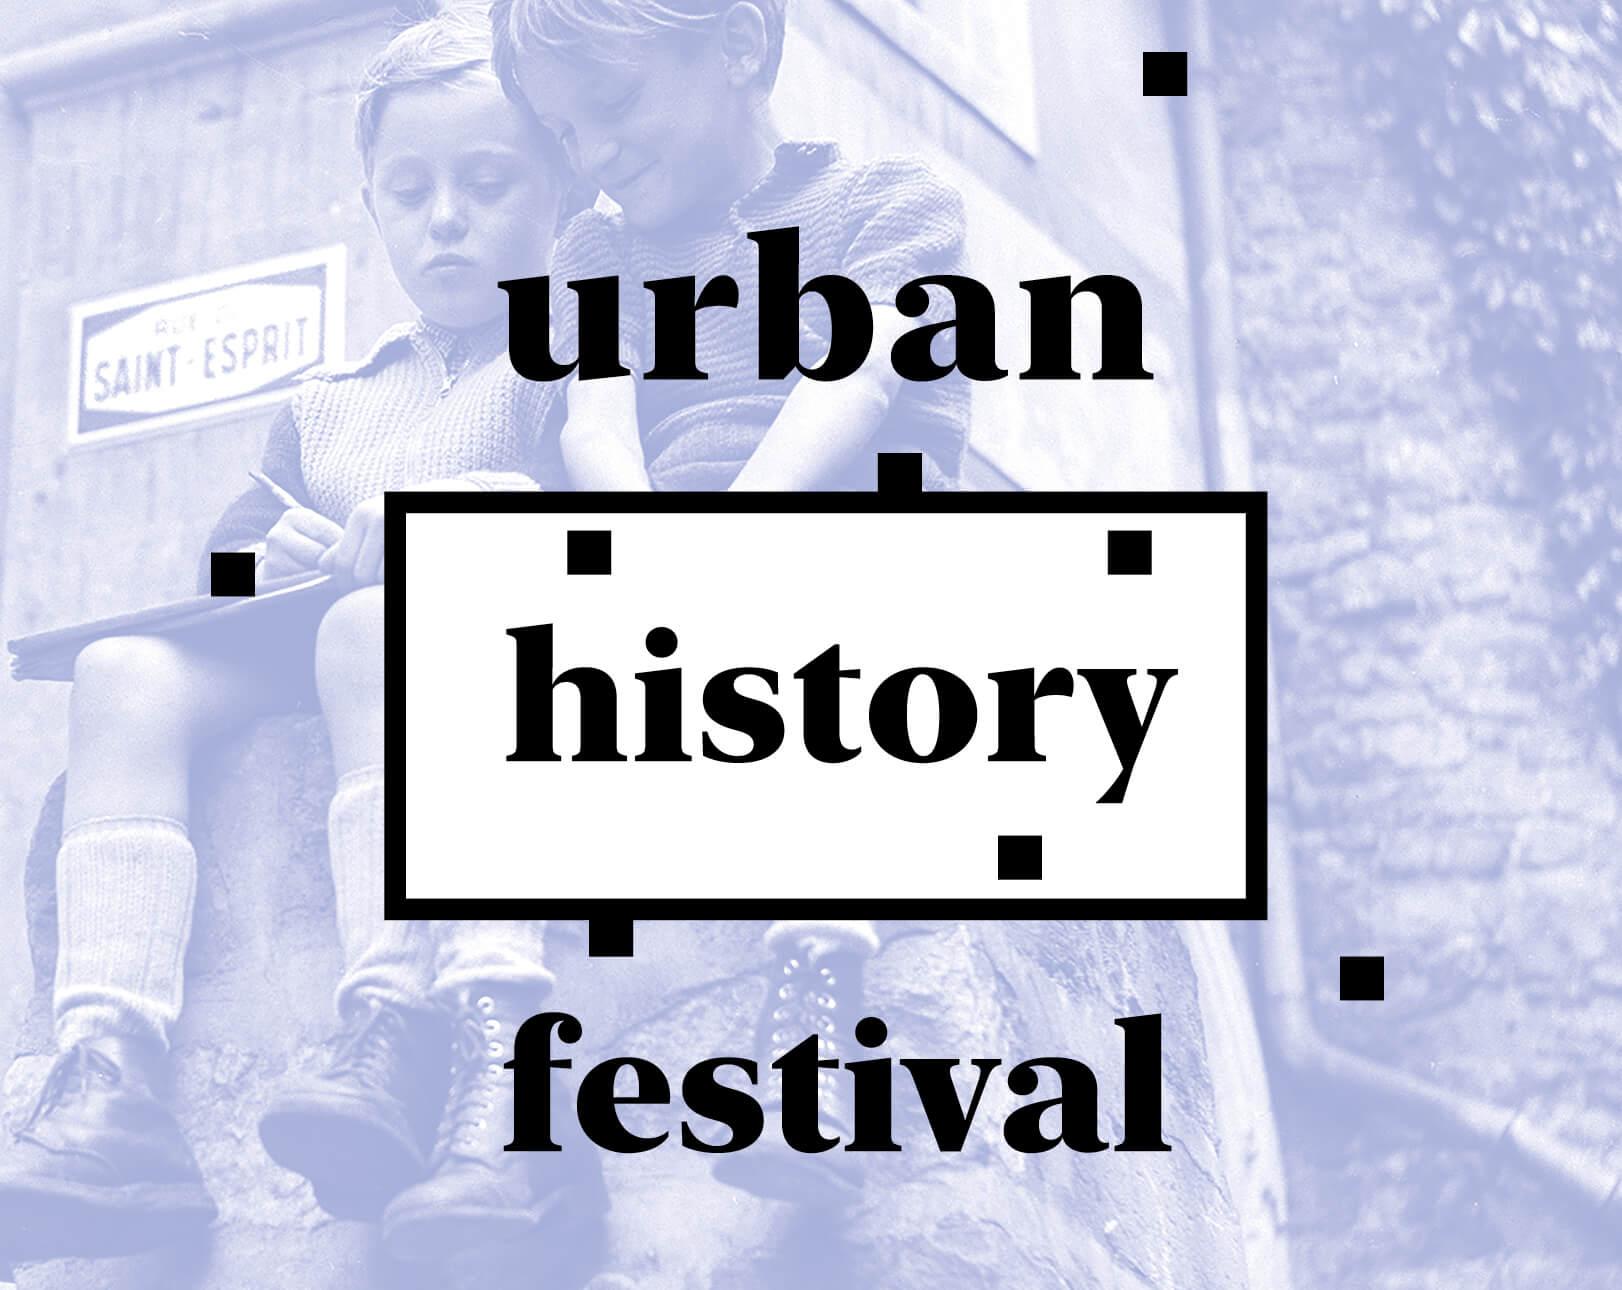 Lëtzebuerg City Museum – Urban History Festival